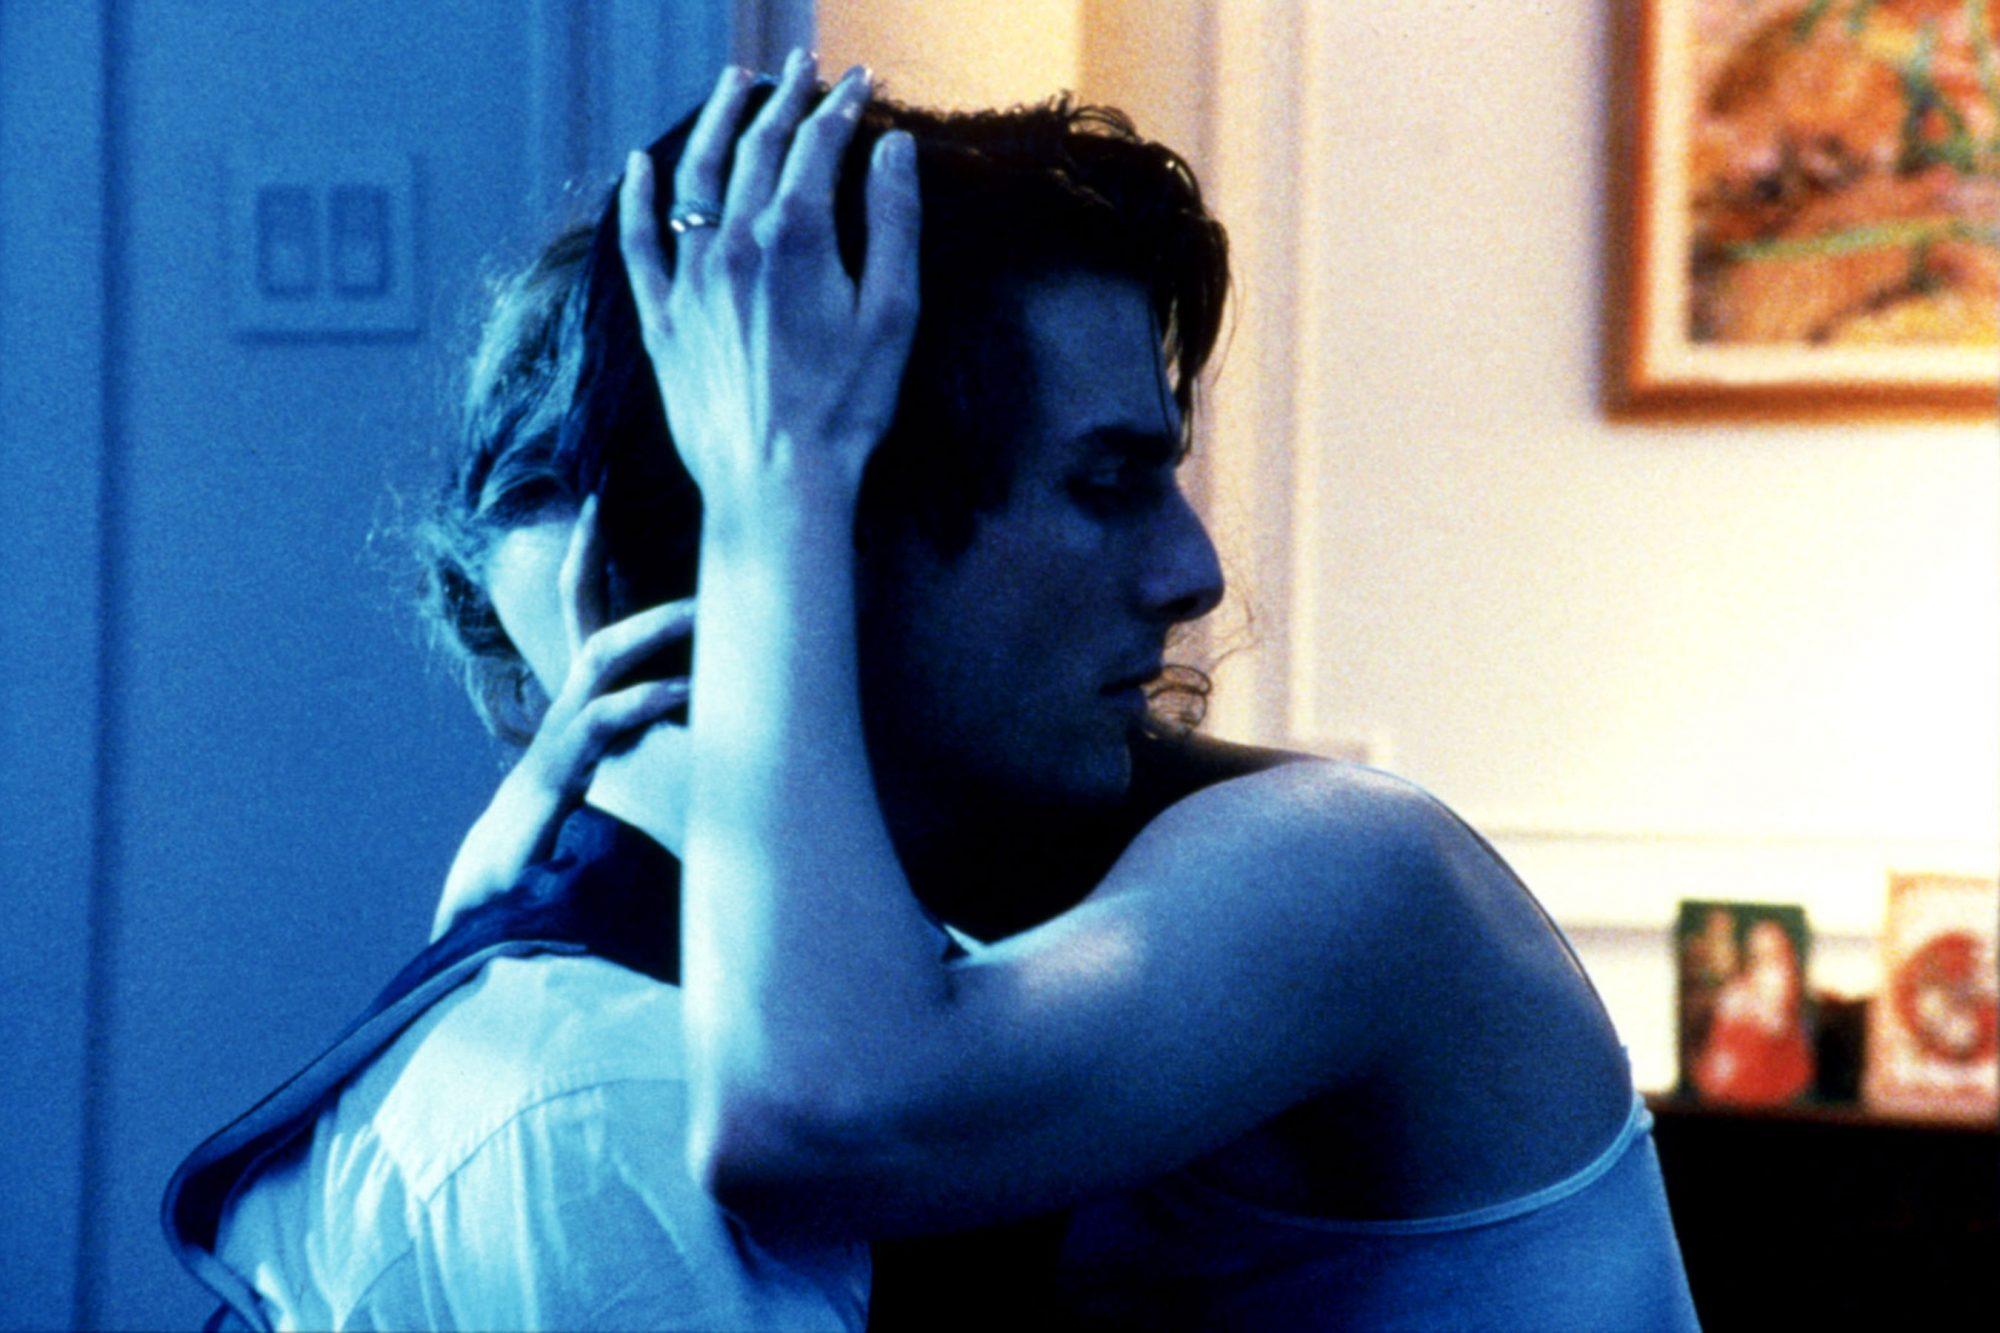 EYES WIDE SHUT, Tom Cruise, Nicole Kidman, 1999